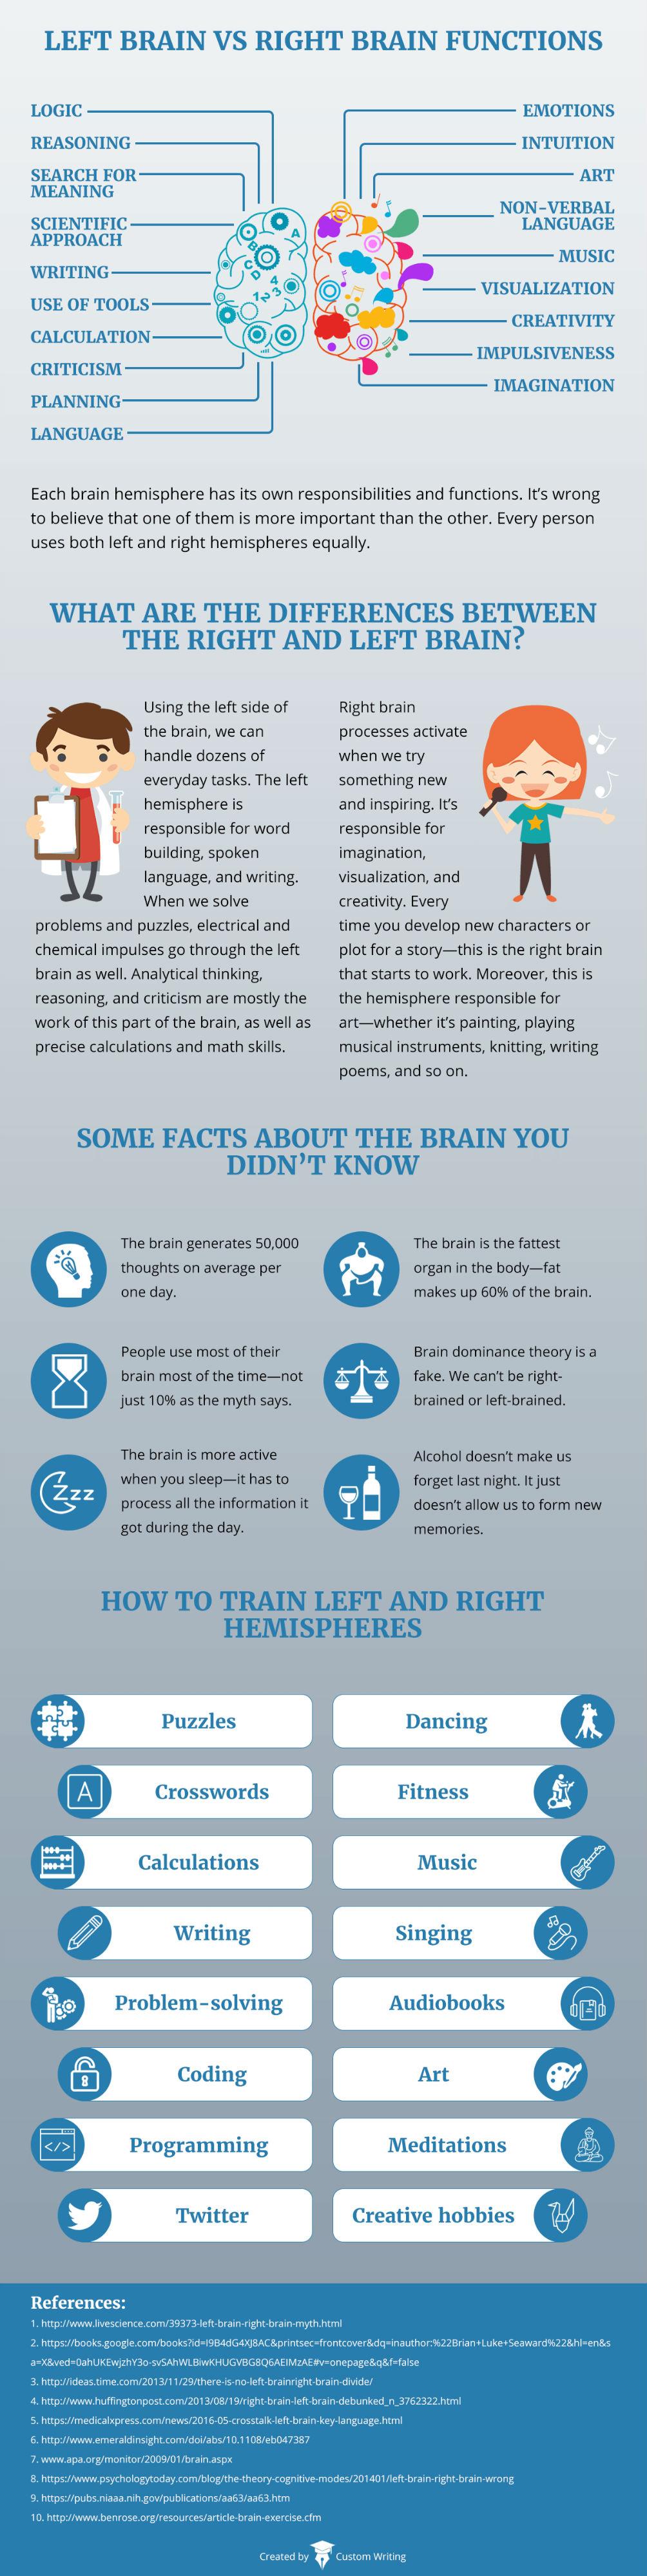 Left Brain vs. Right Brain Functions [Infographic]